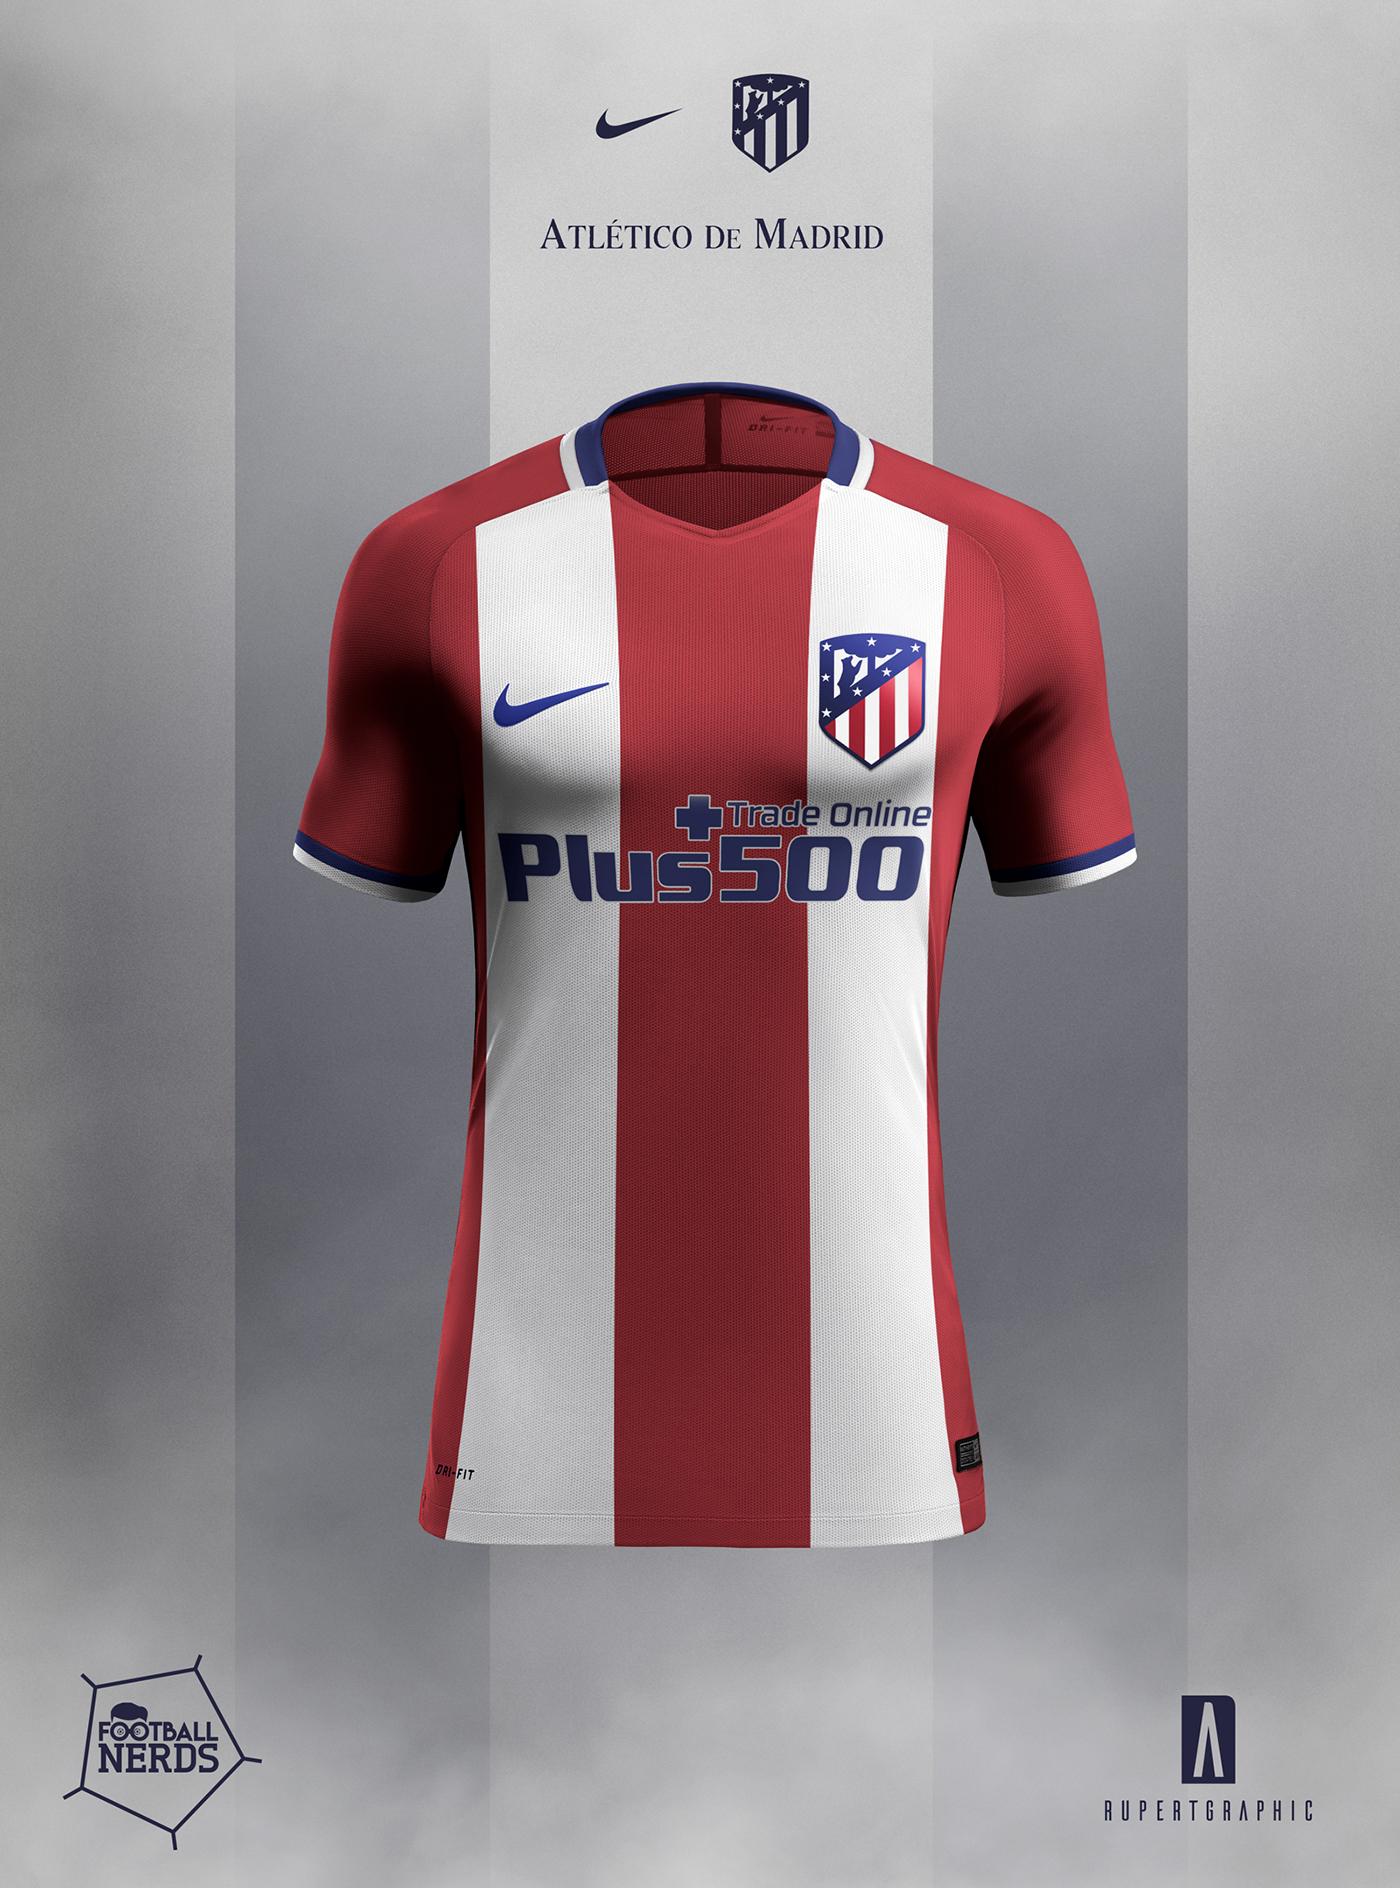 8d0076feb Atletico de Madrid 2017/18 Concept - Nike on Behance